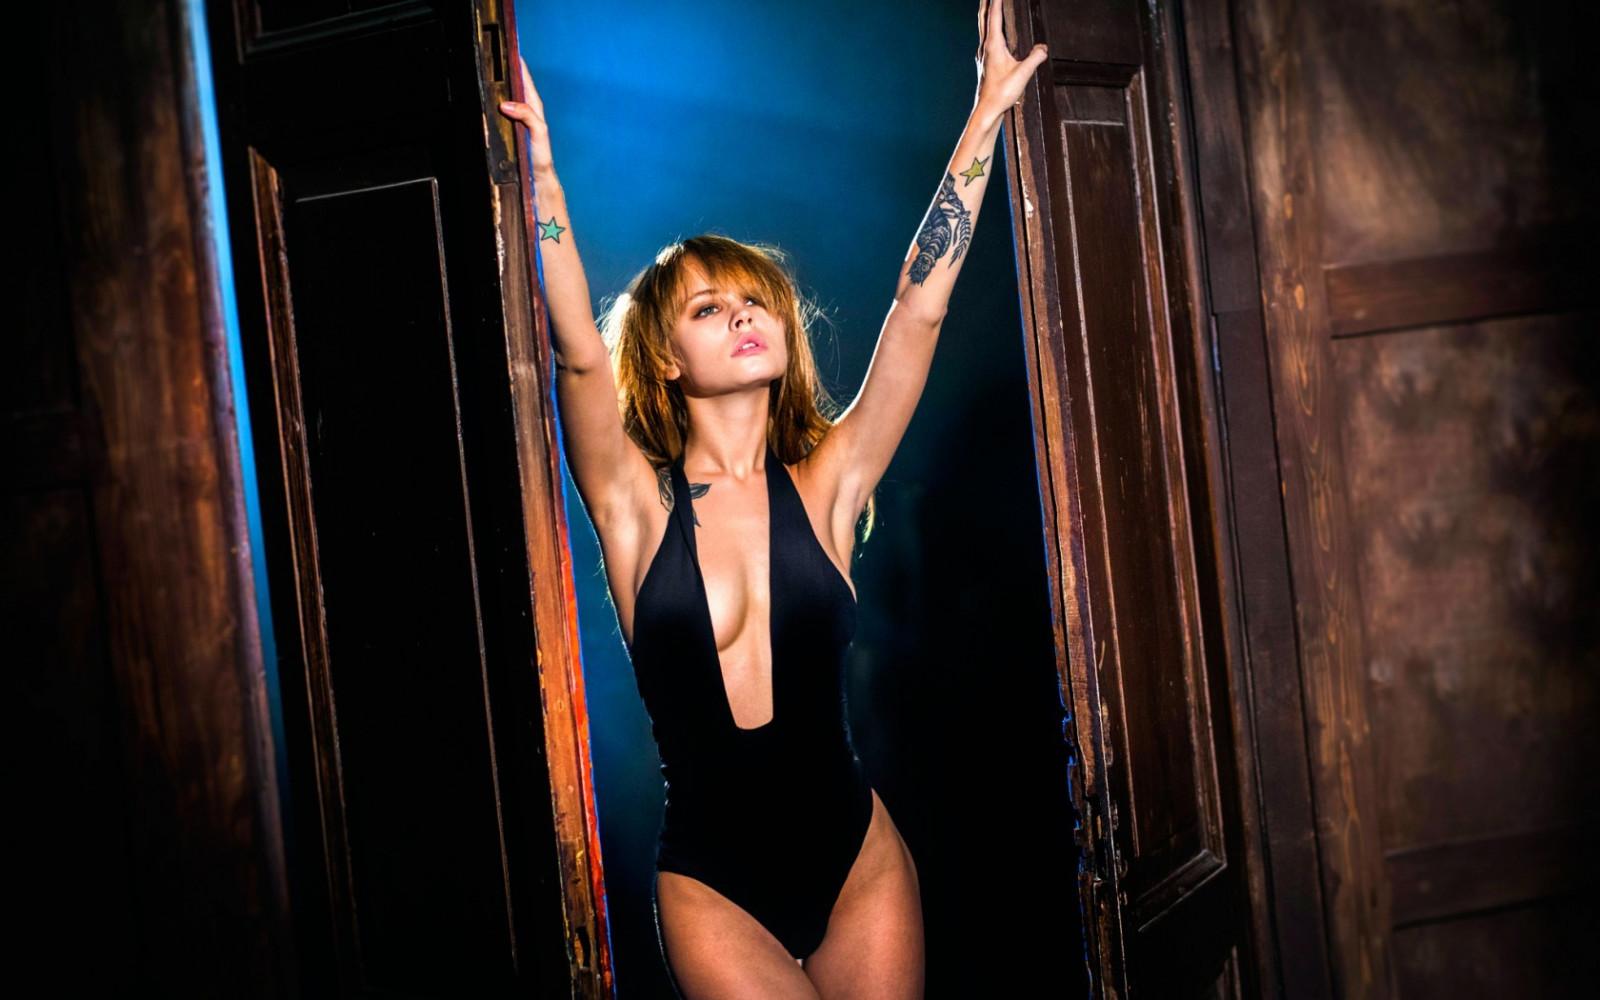 women, model, blonde, looking away, brunette, Anastasia Scheglova, arms up, tattoo, armpits, cleavage, fashion, boobs, one piece swimsuit, Vladimir Nikolaev, Vavaca, beauty, muscle, photo shoot, performance art